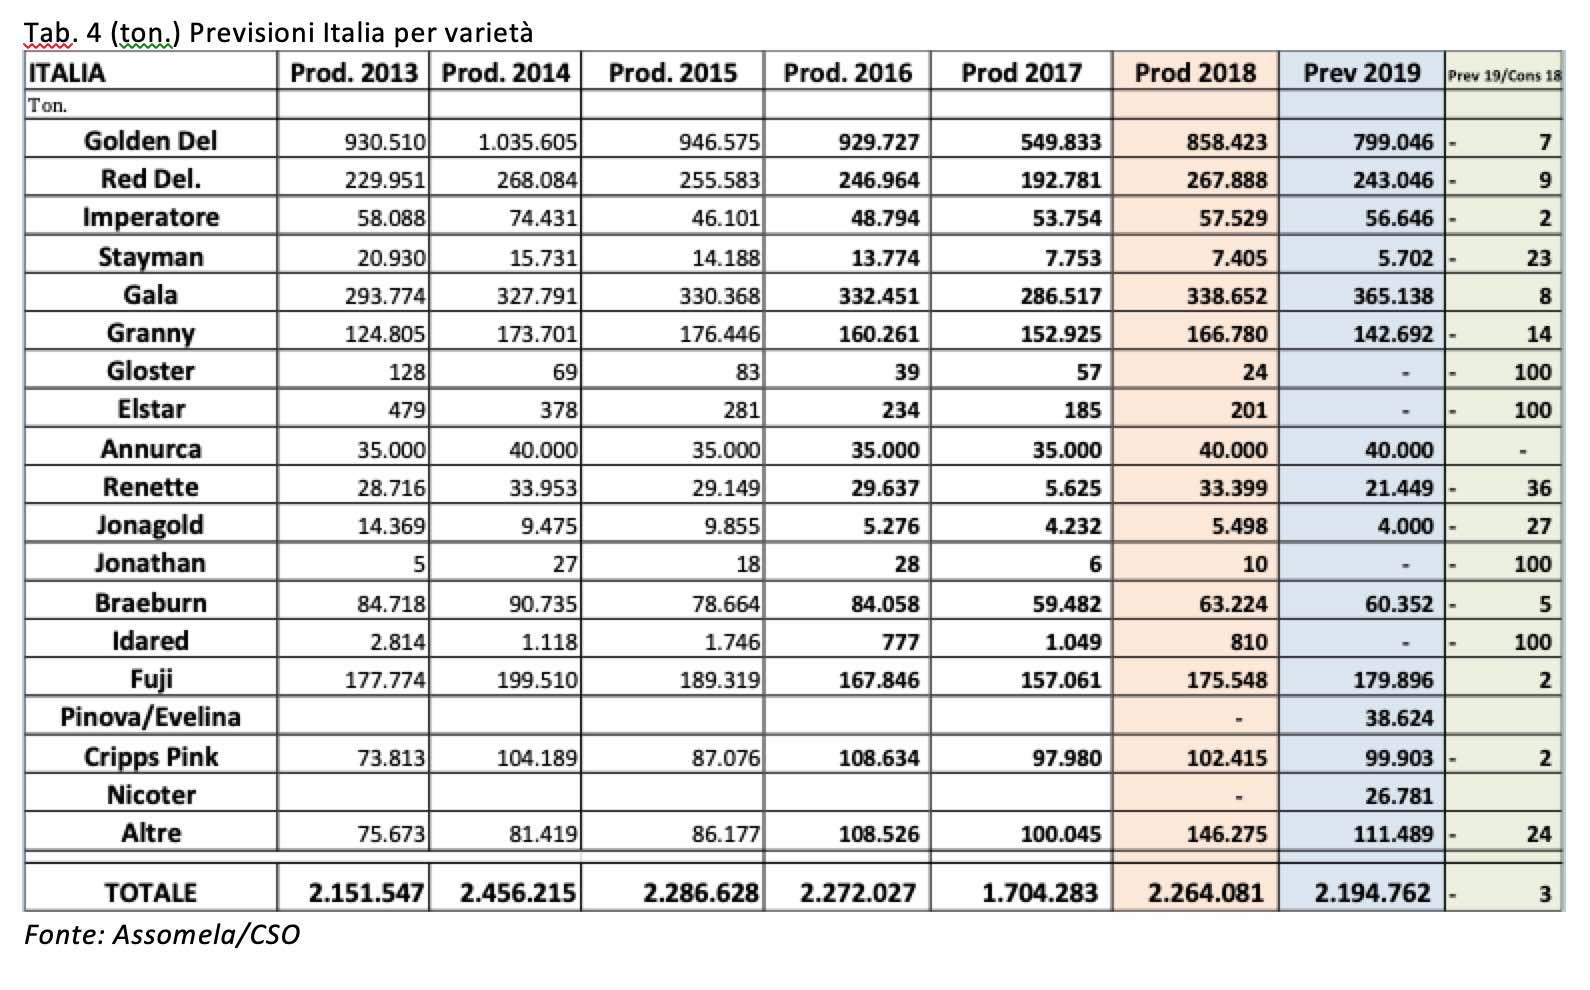 Prognosfruit-2019-mele-Italia-varieta